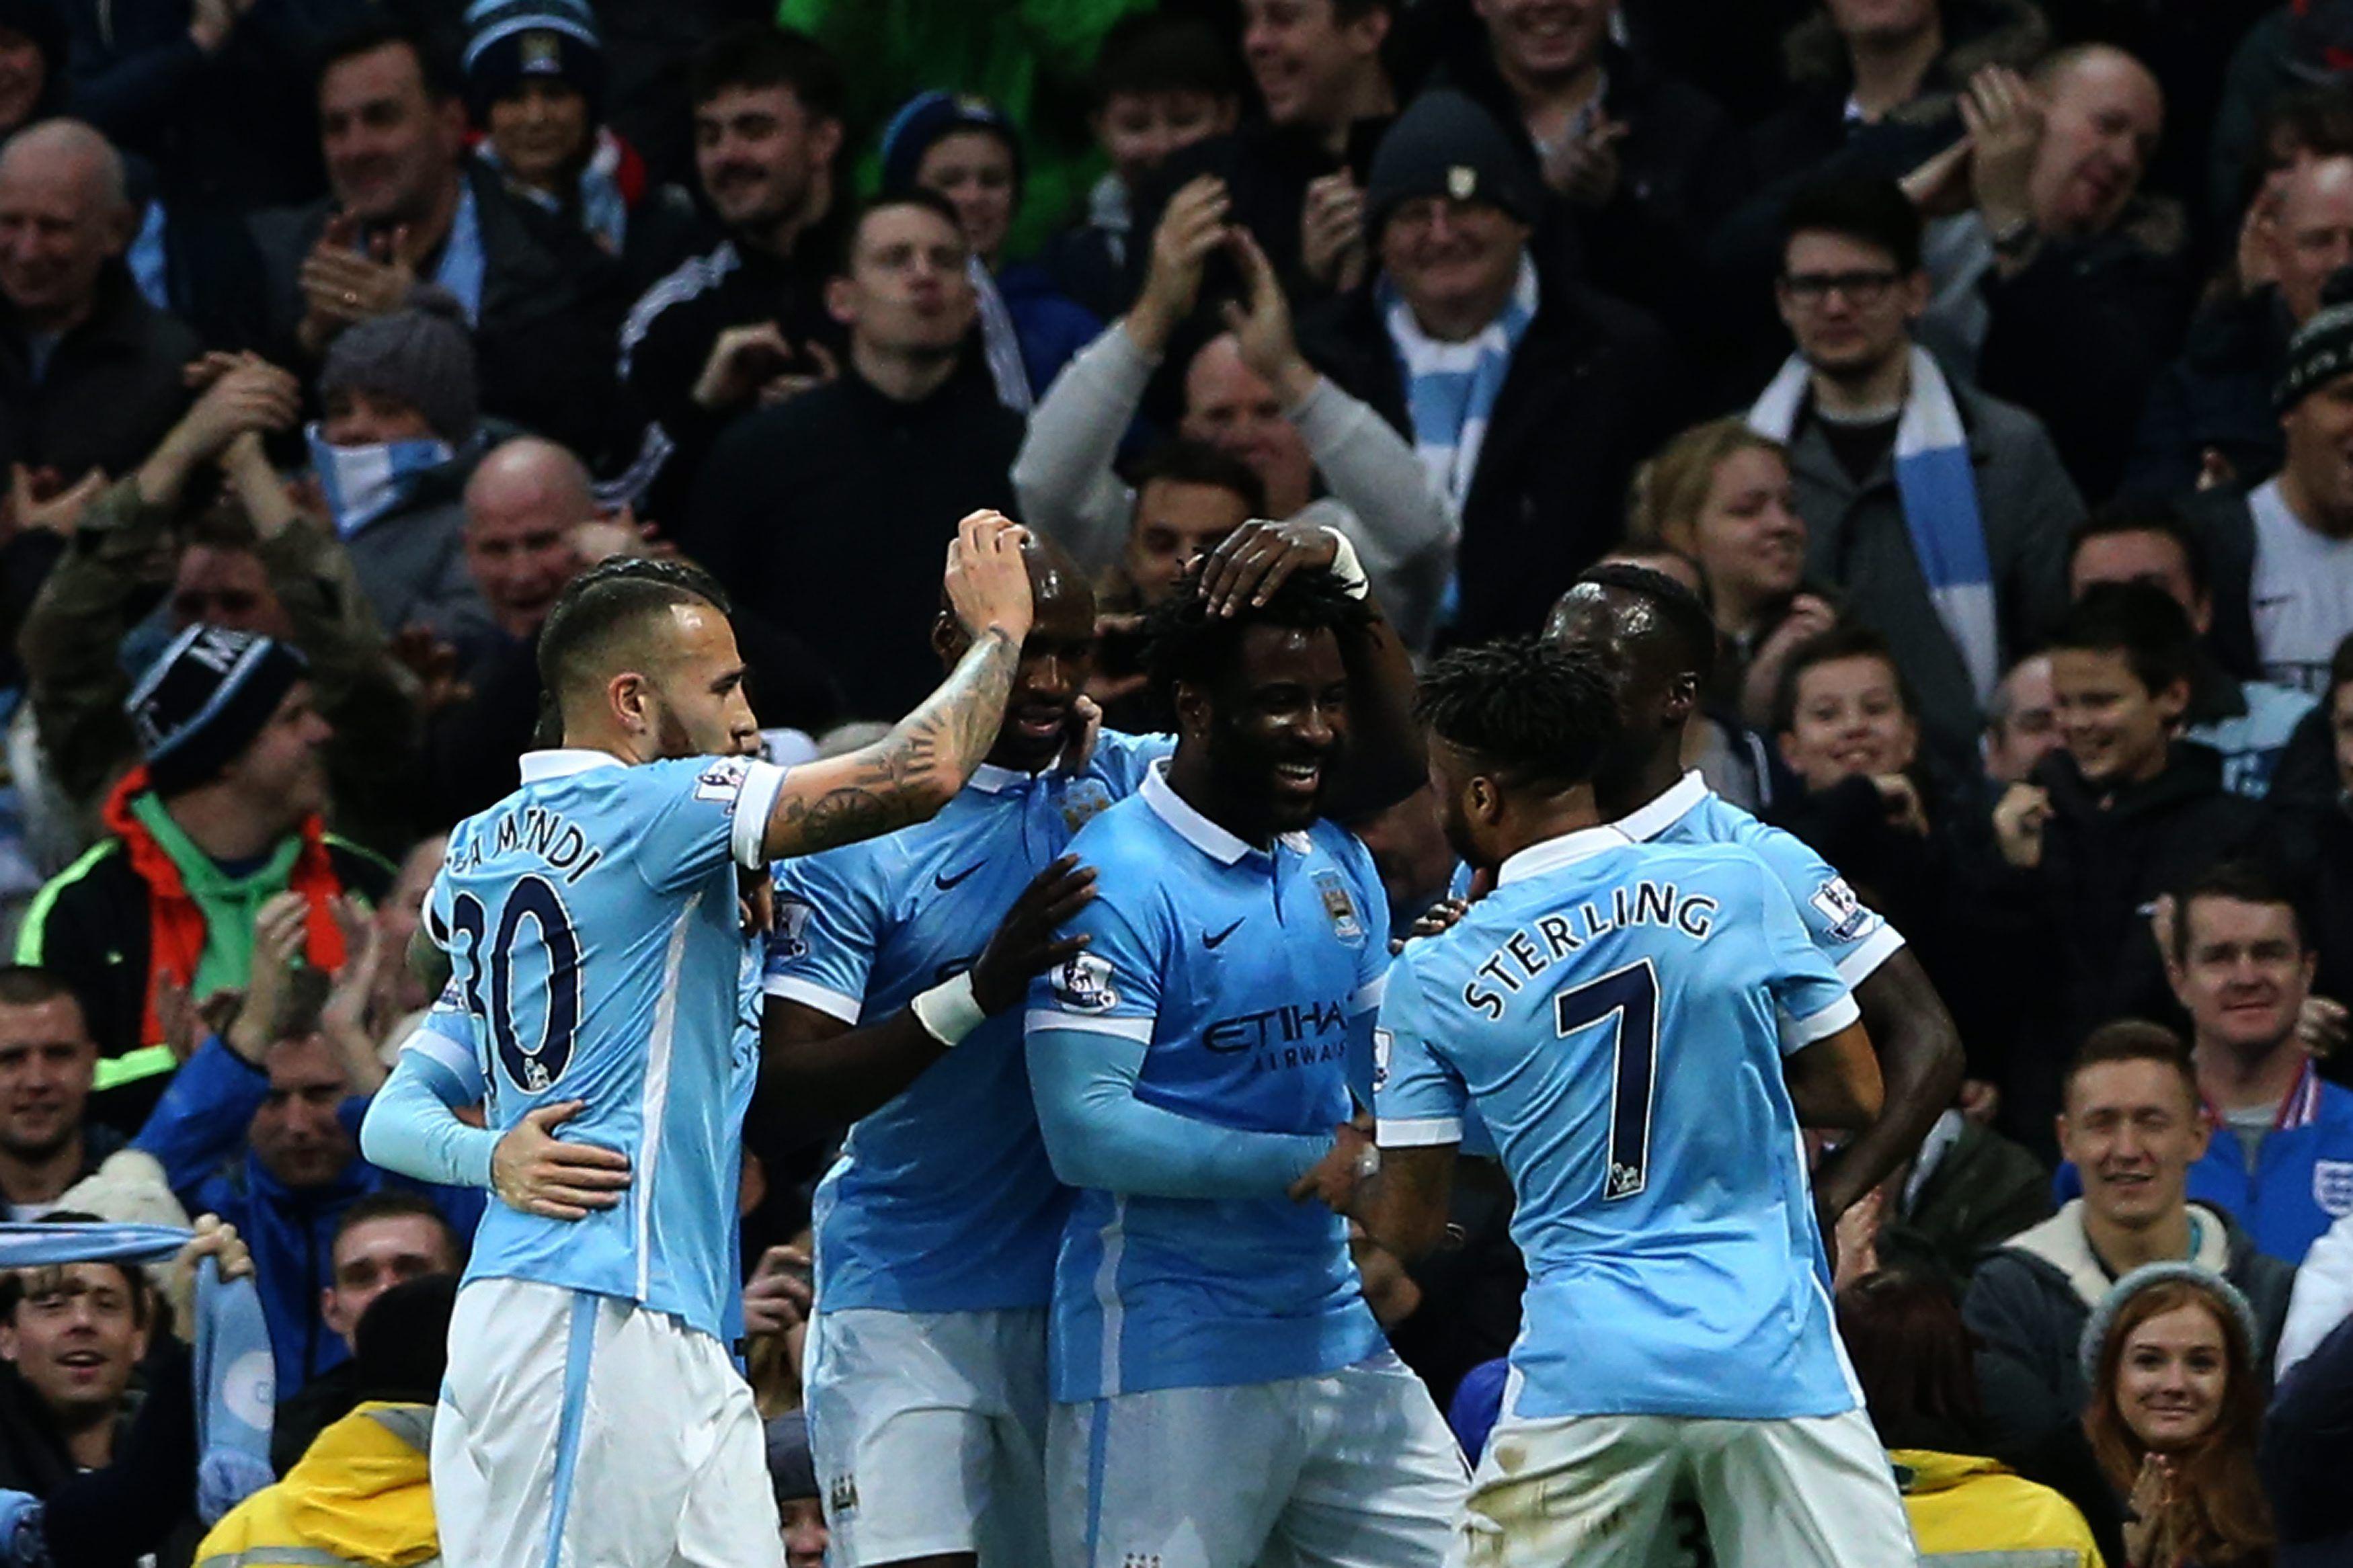 El Manchester City goleó al Sunderland y se acerca a la cima de la Premier